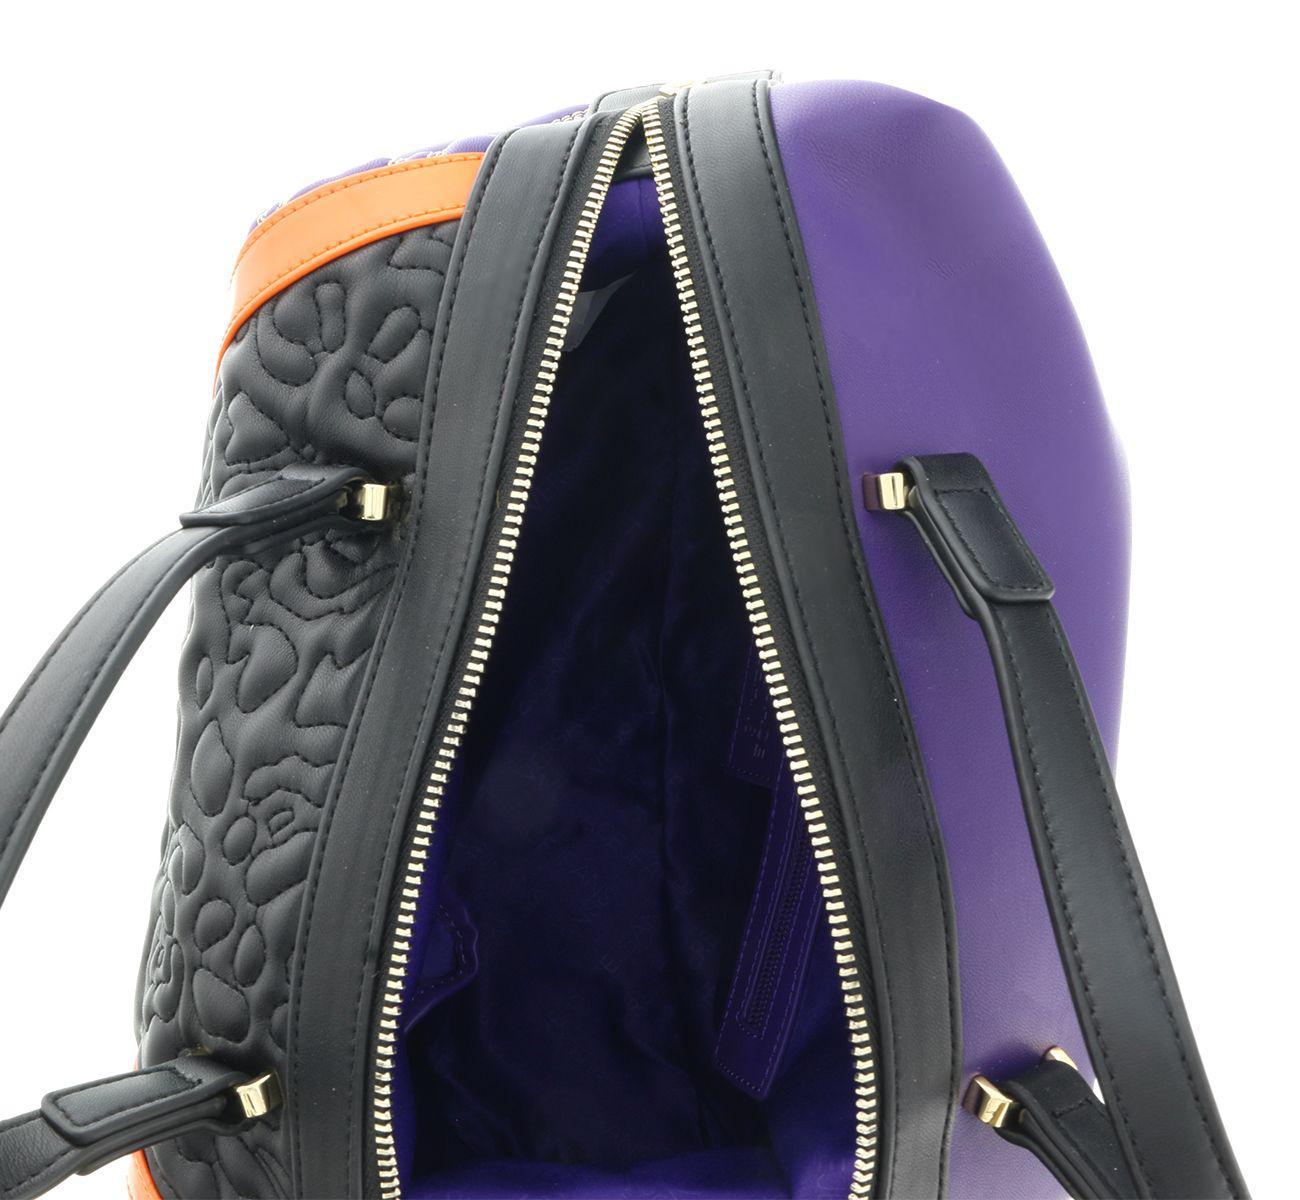 27bfd3f9113d Versace - Ee1vobbk3 Emgh Black purple Satchel - Lyst. View fullscreen